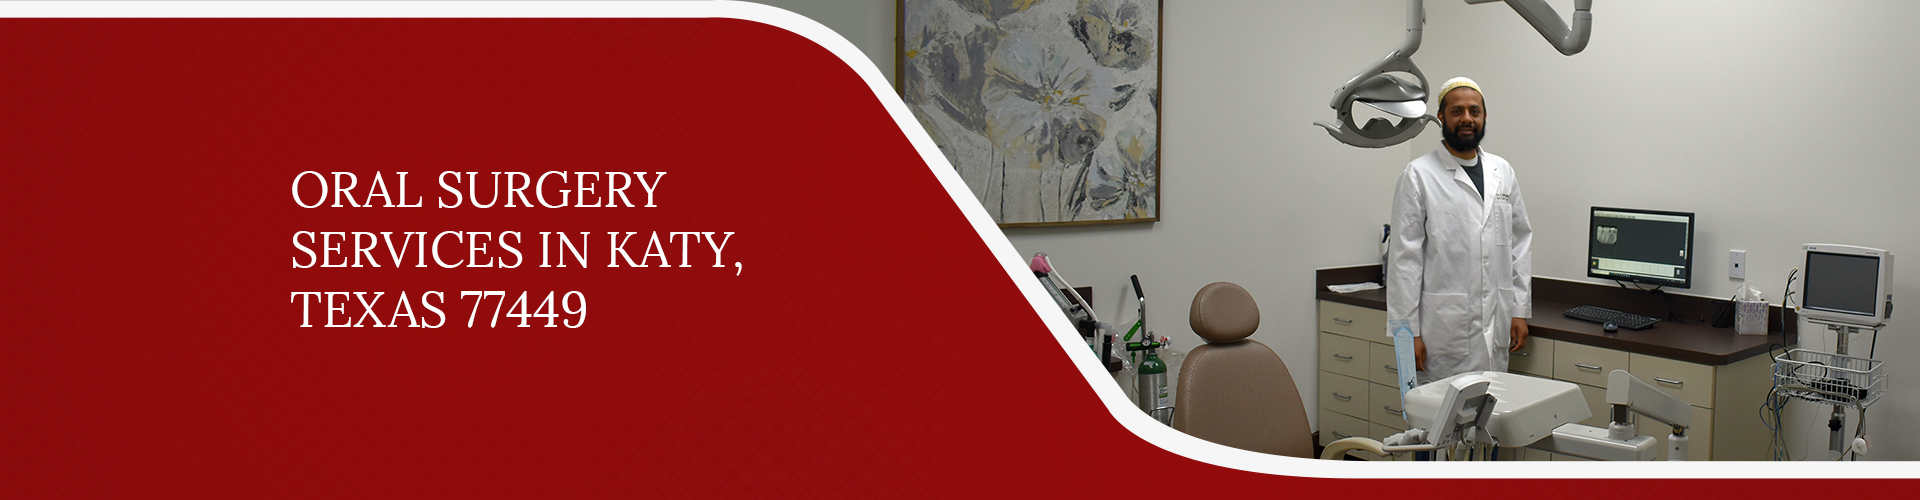 Oral Surgery Services In Katy, Texas 77449